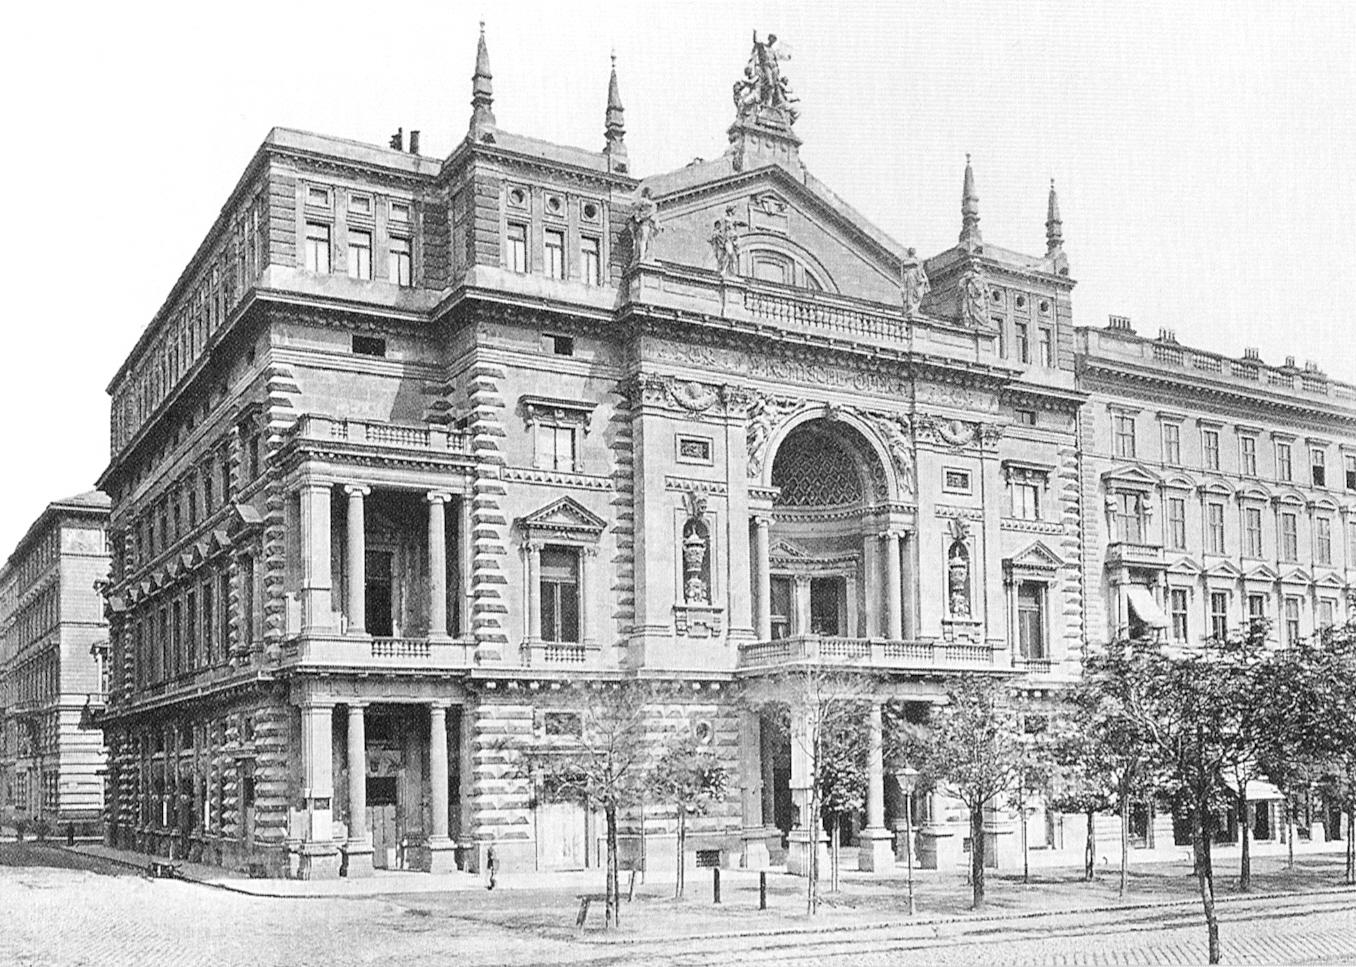 ringtheater vor1881.jpg